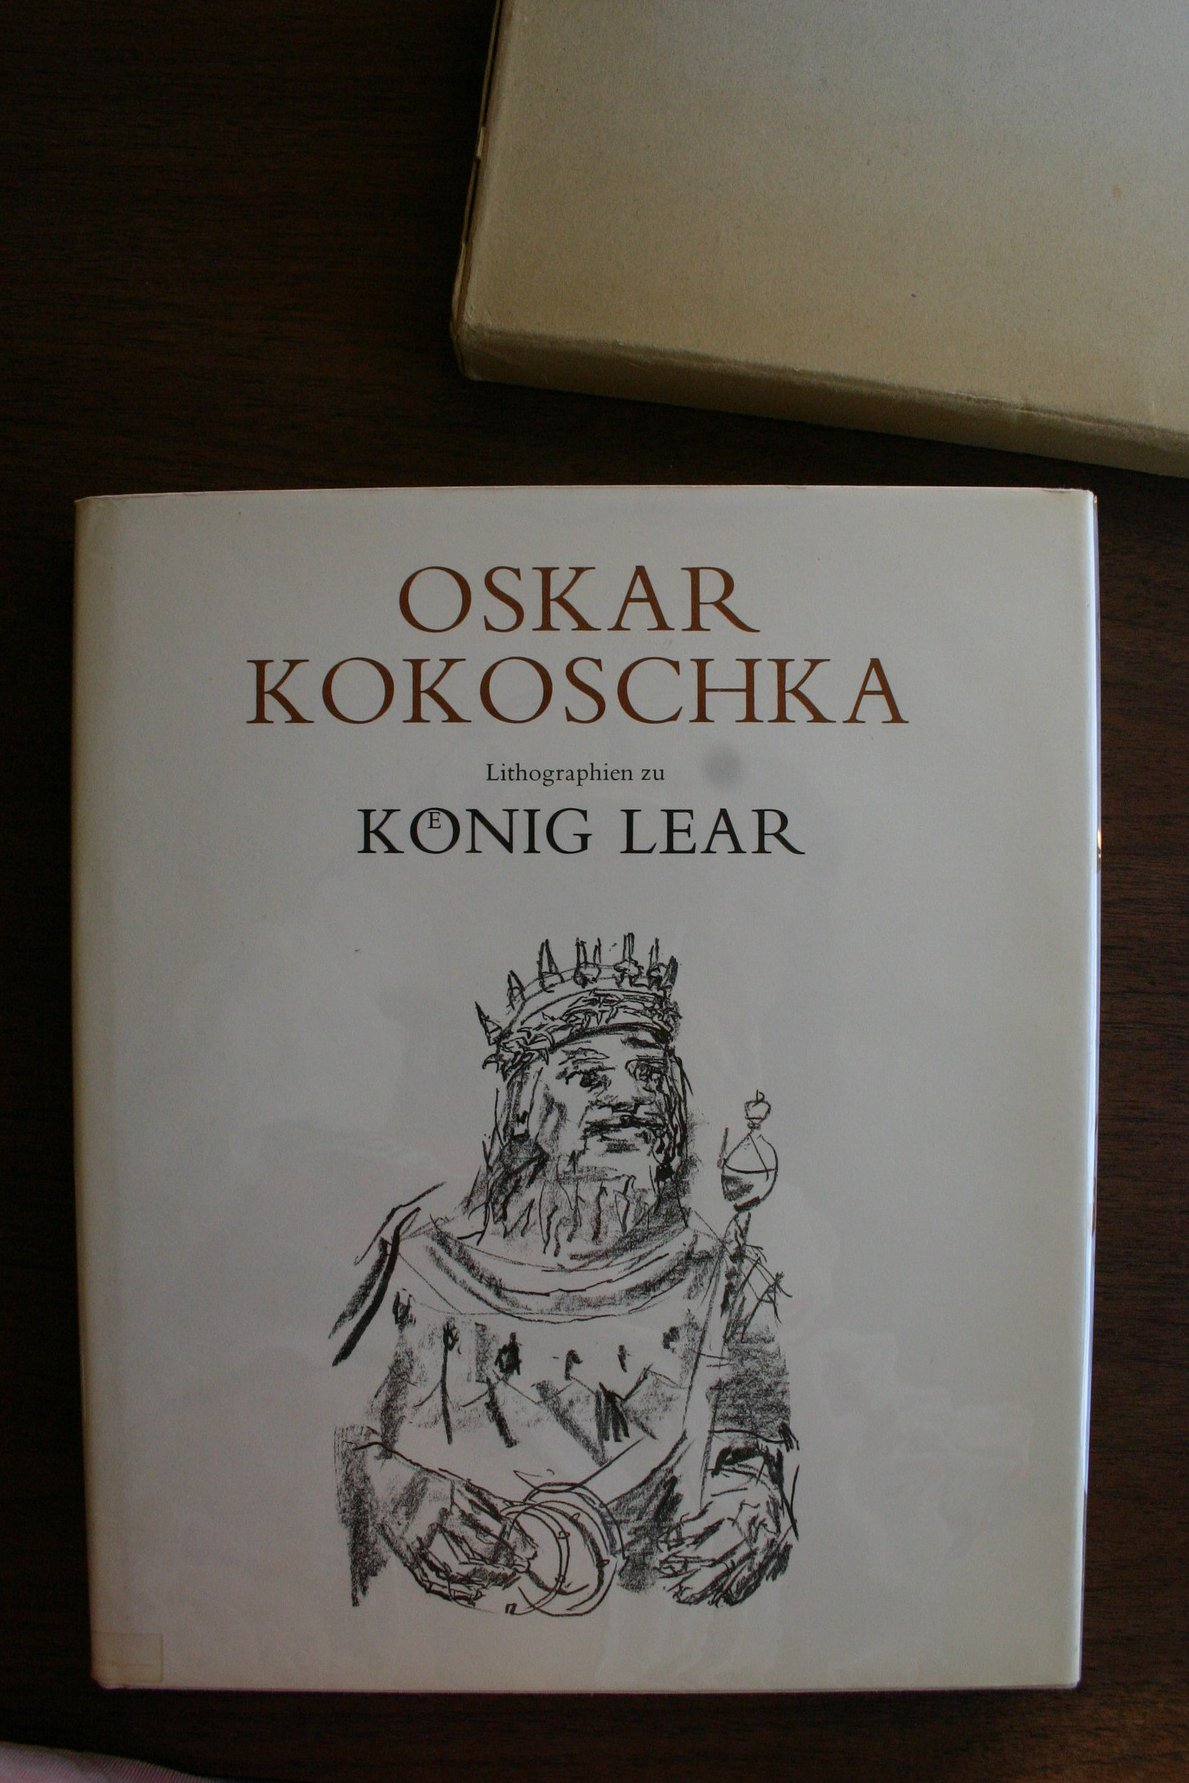 Koenig Lear